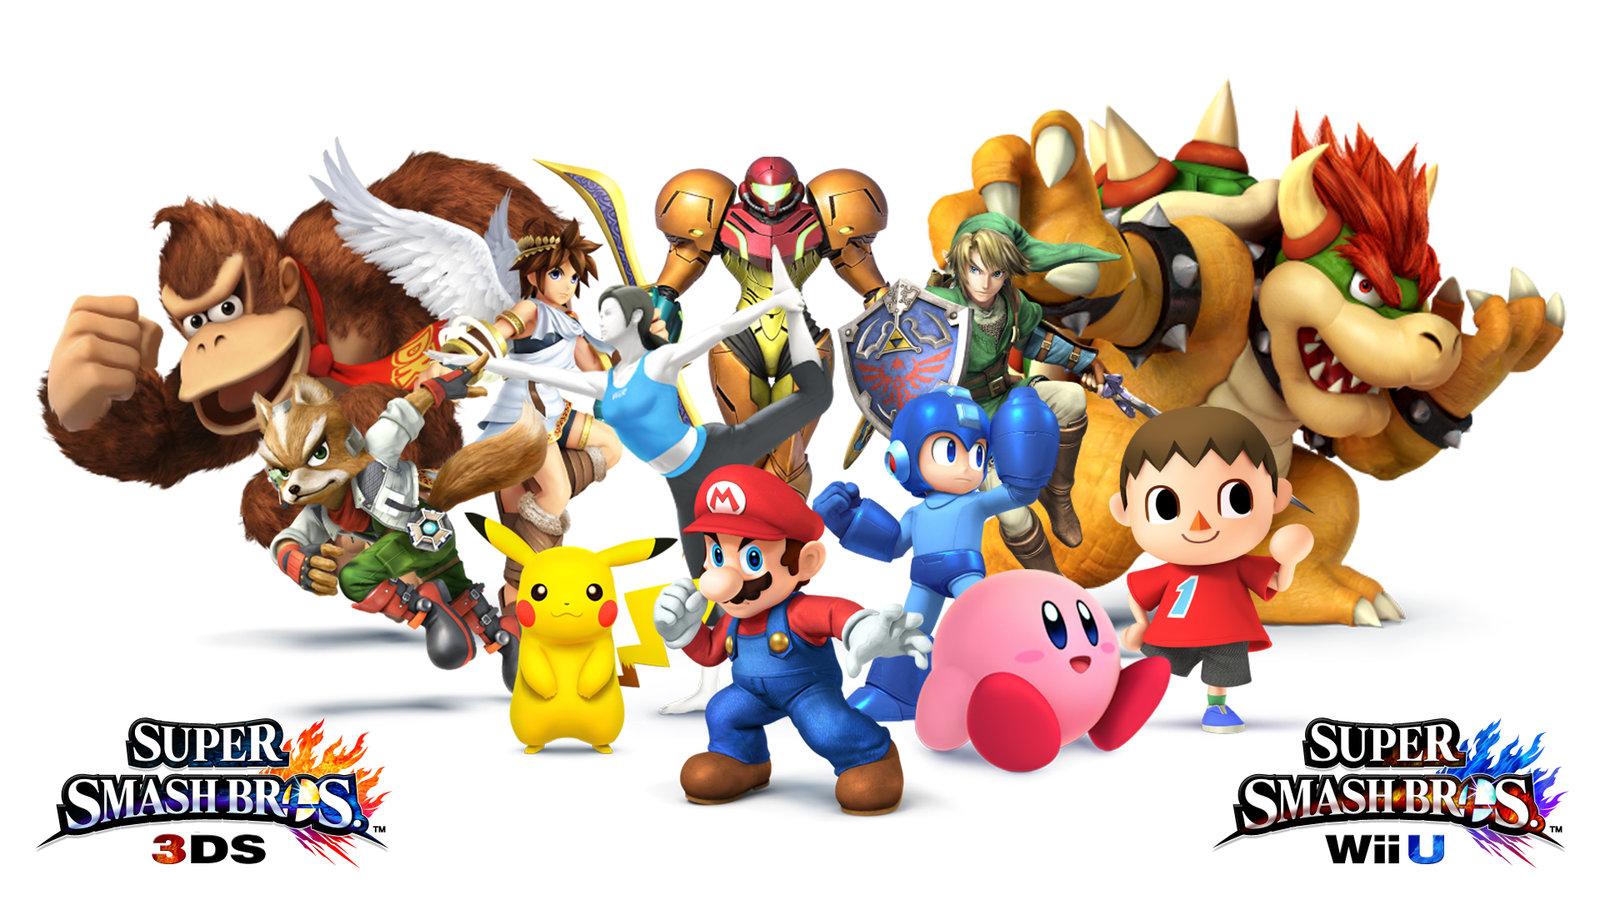 Super Smash Bros for Wii U – Wallpaper